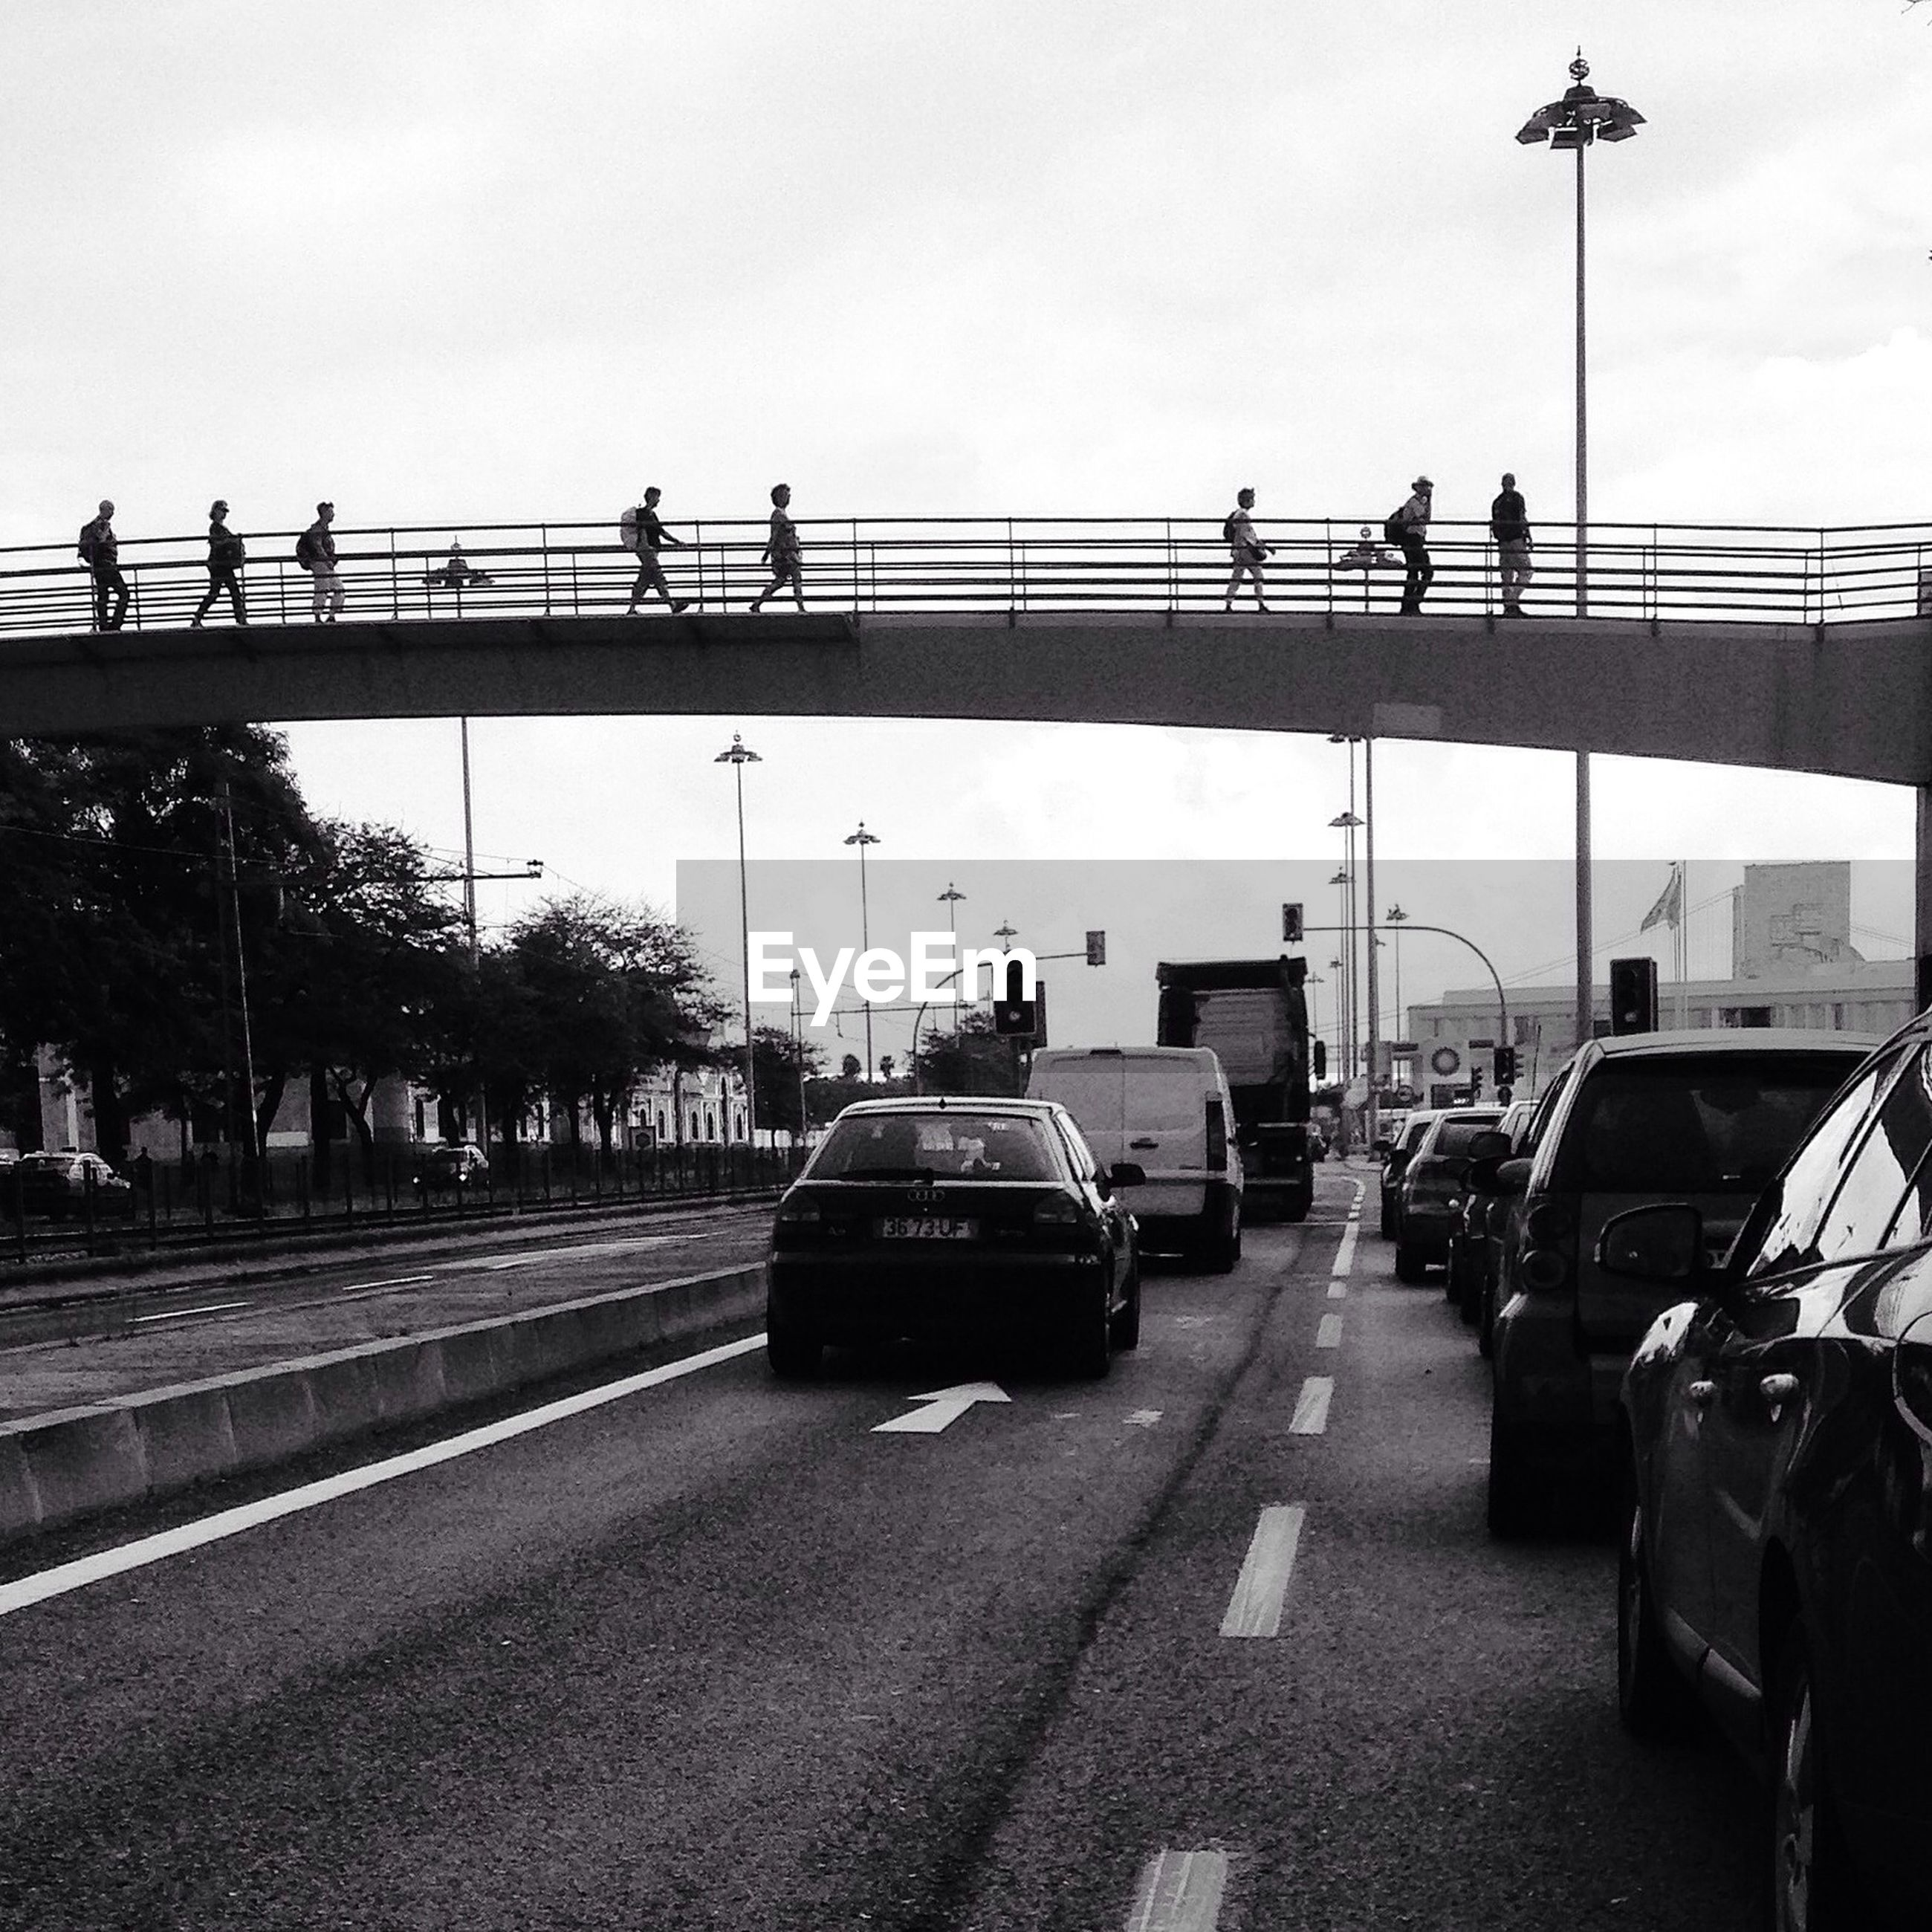 People walking on bridge over city street